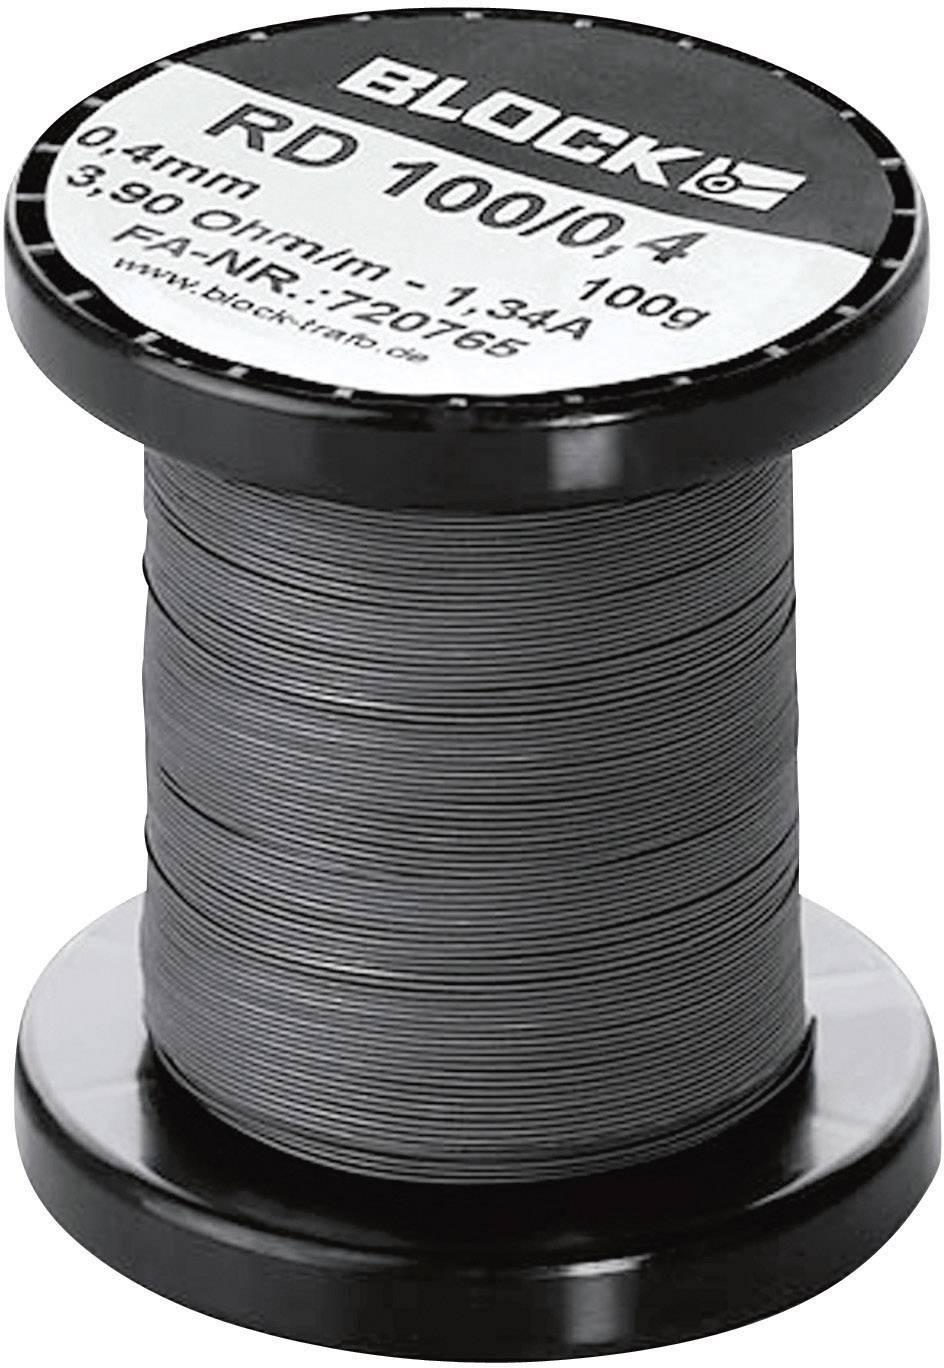 Odporový drát (konstantan) Block RD 100/4,0, 0.039 Ω/m, 0.8 m